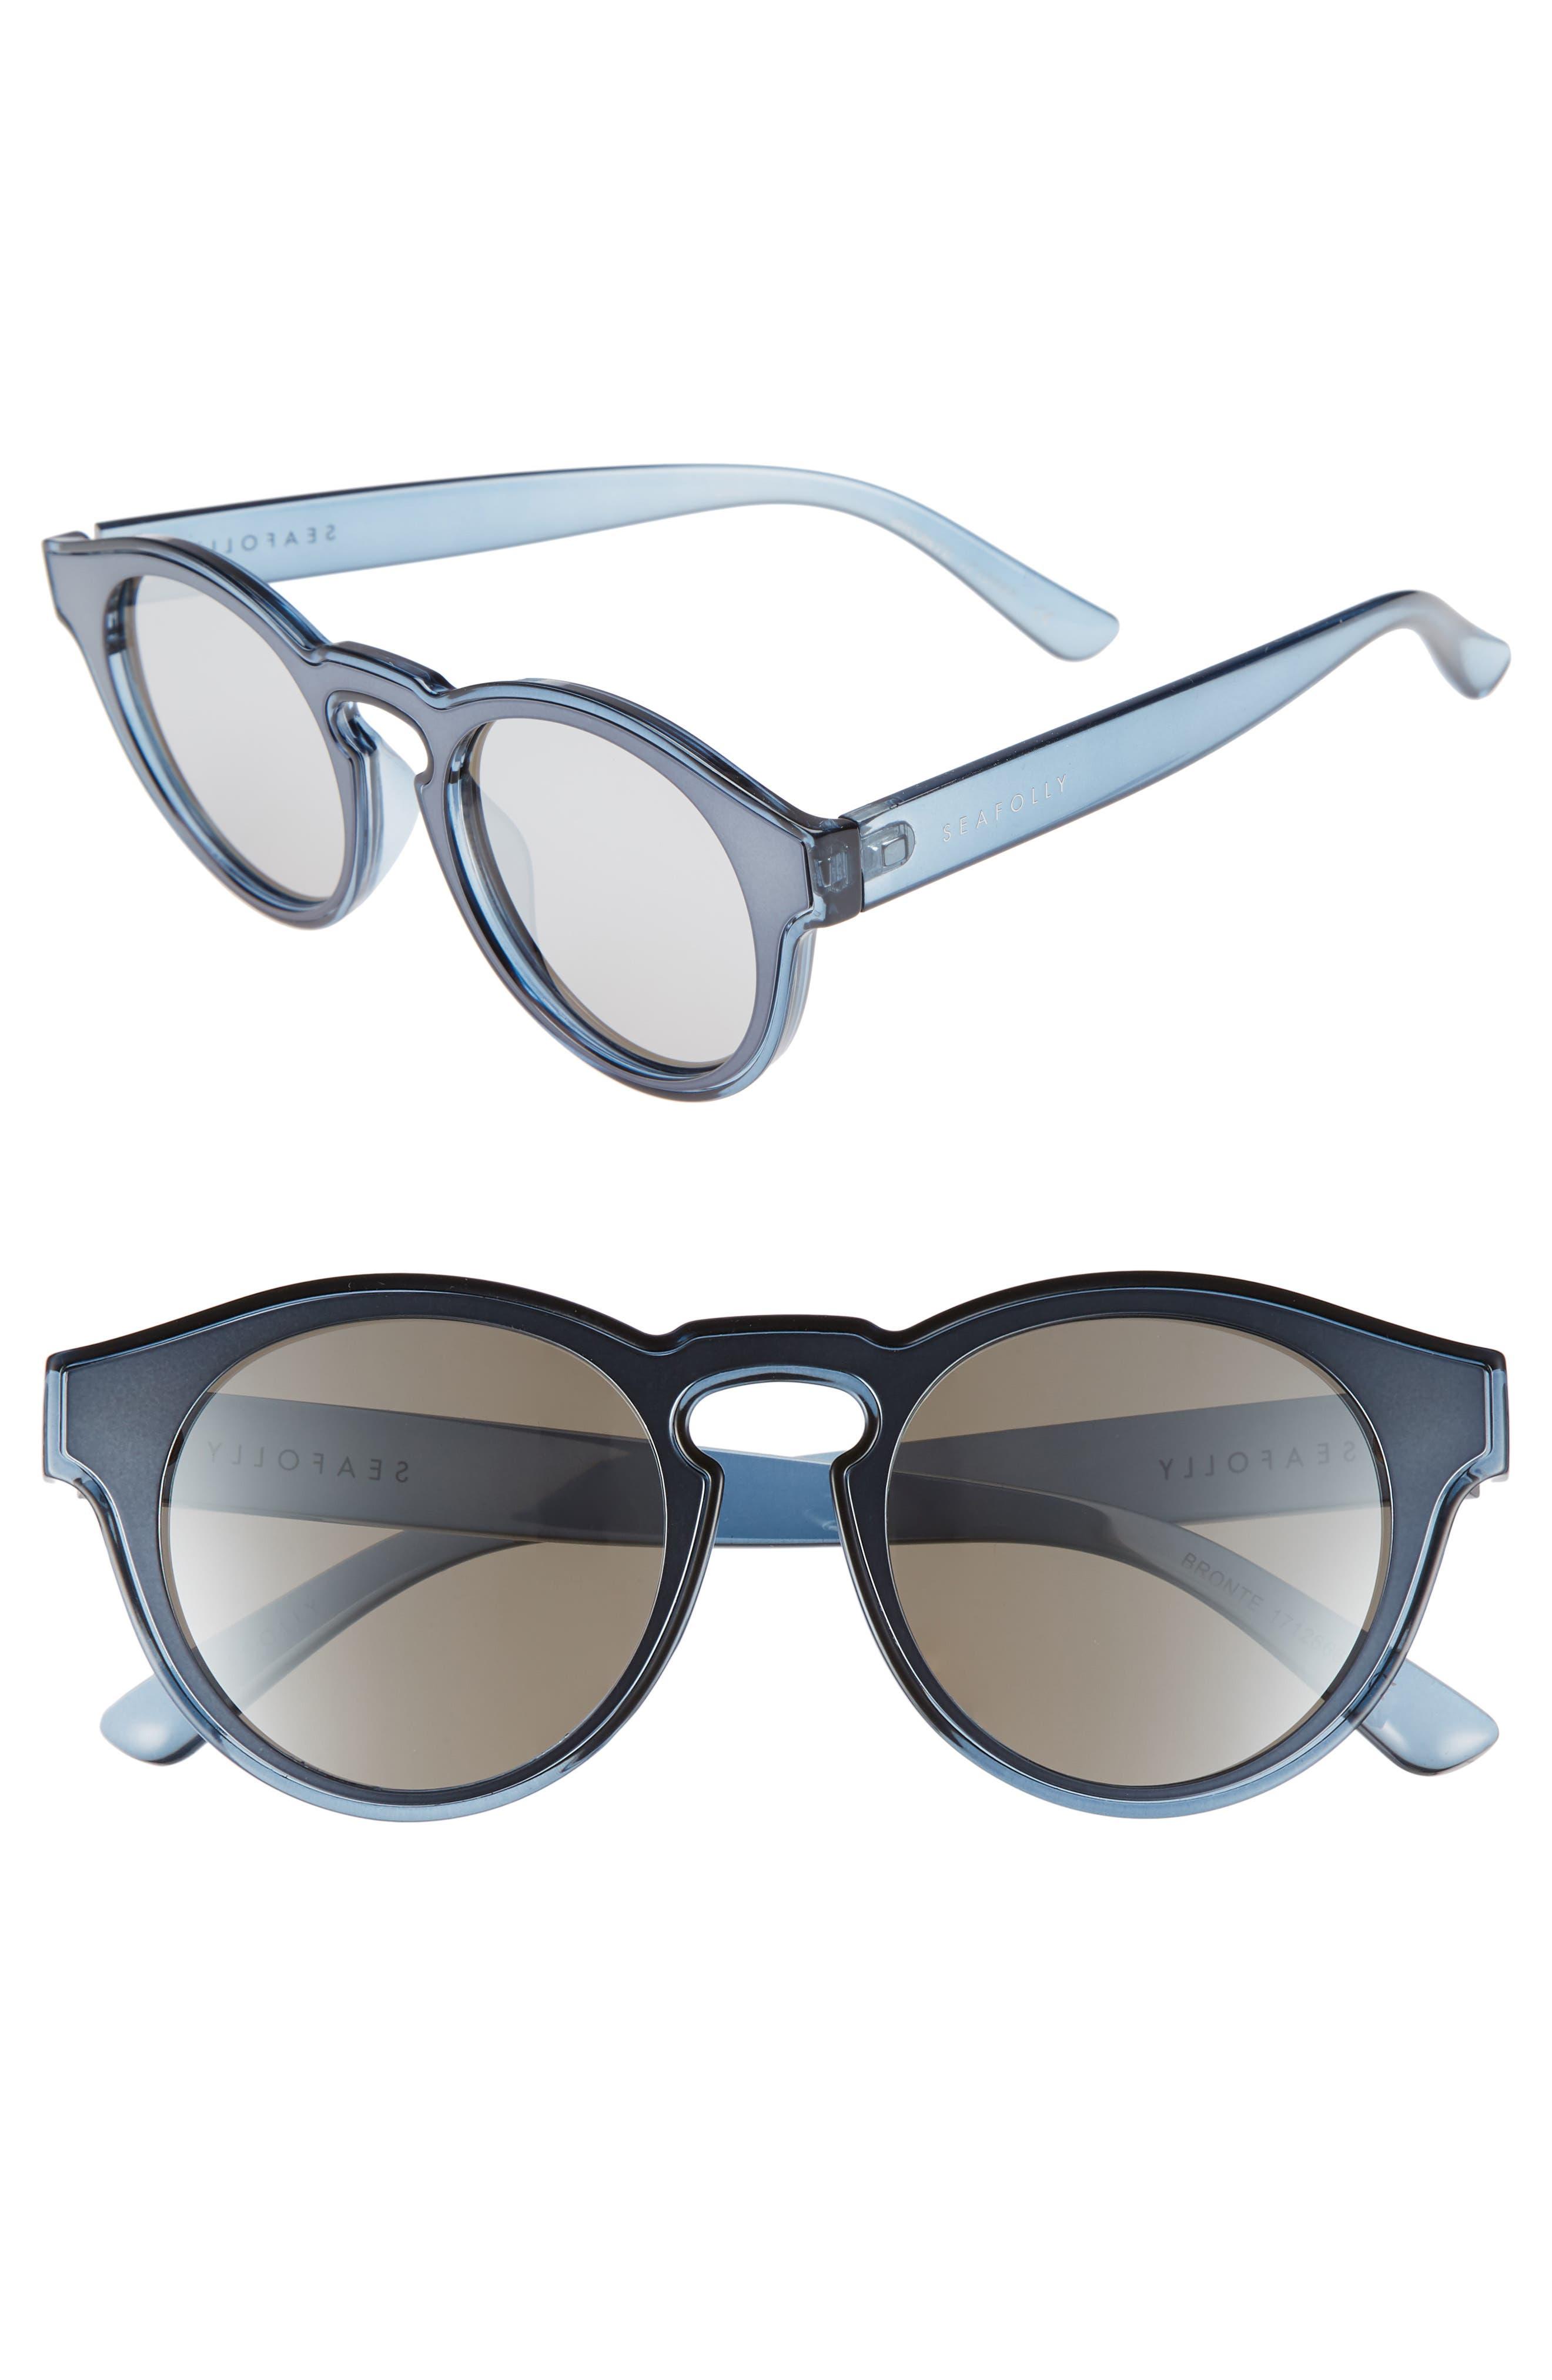 SEAFOLLY Bronte 50mm Sunglasses, Main, color, 400